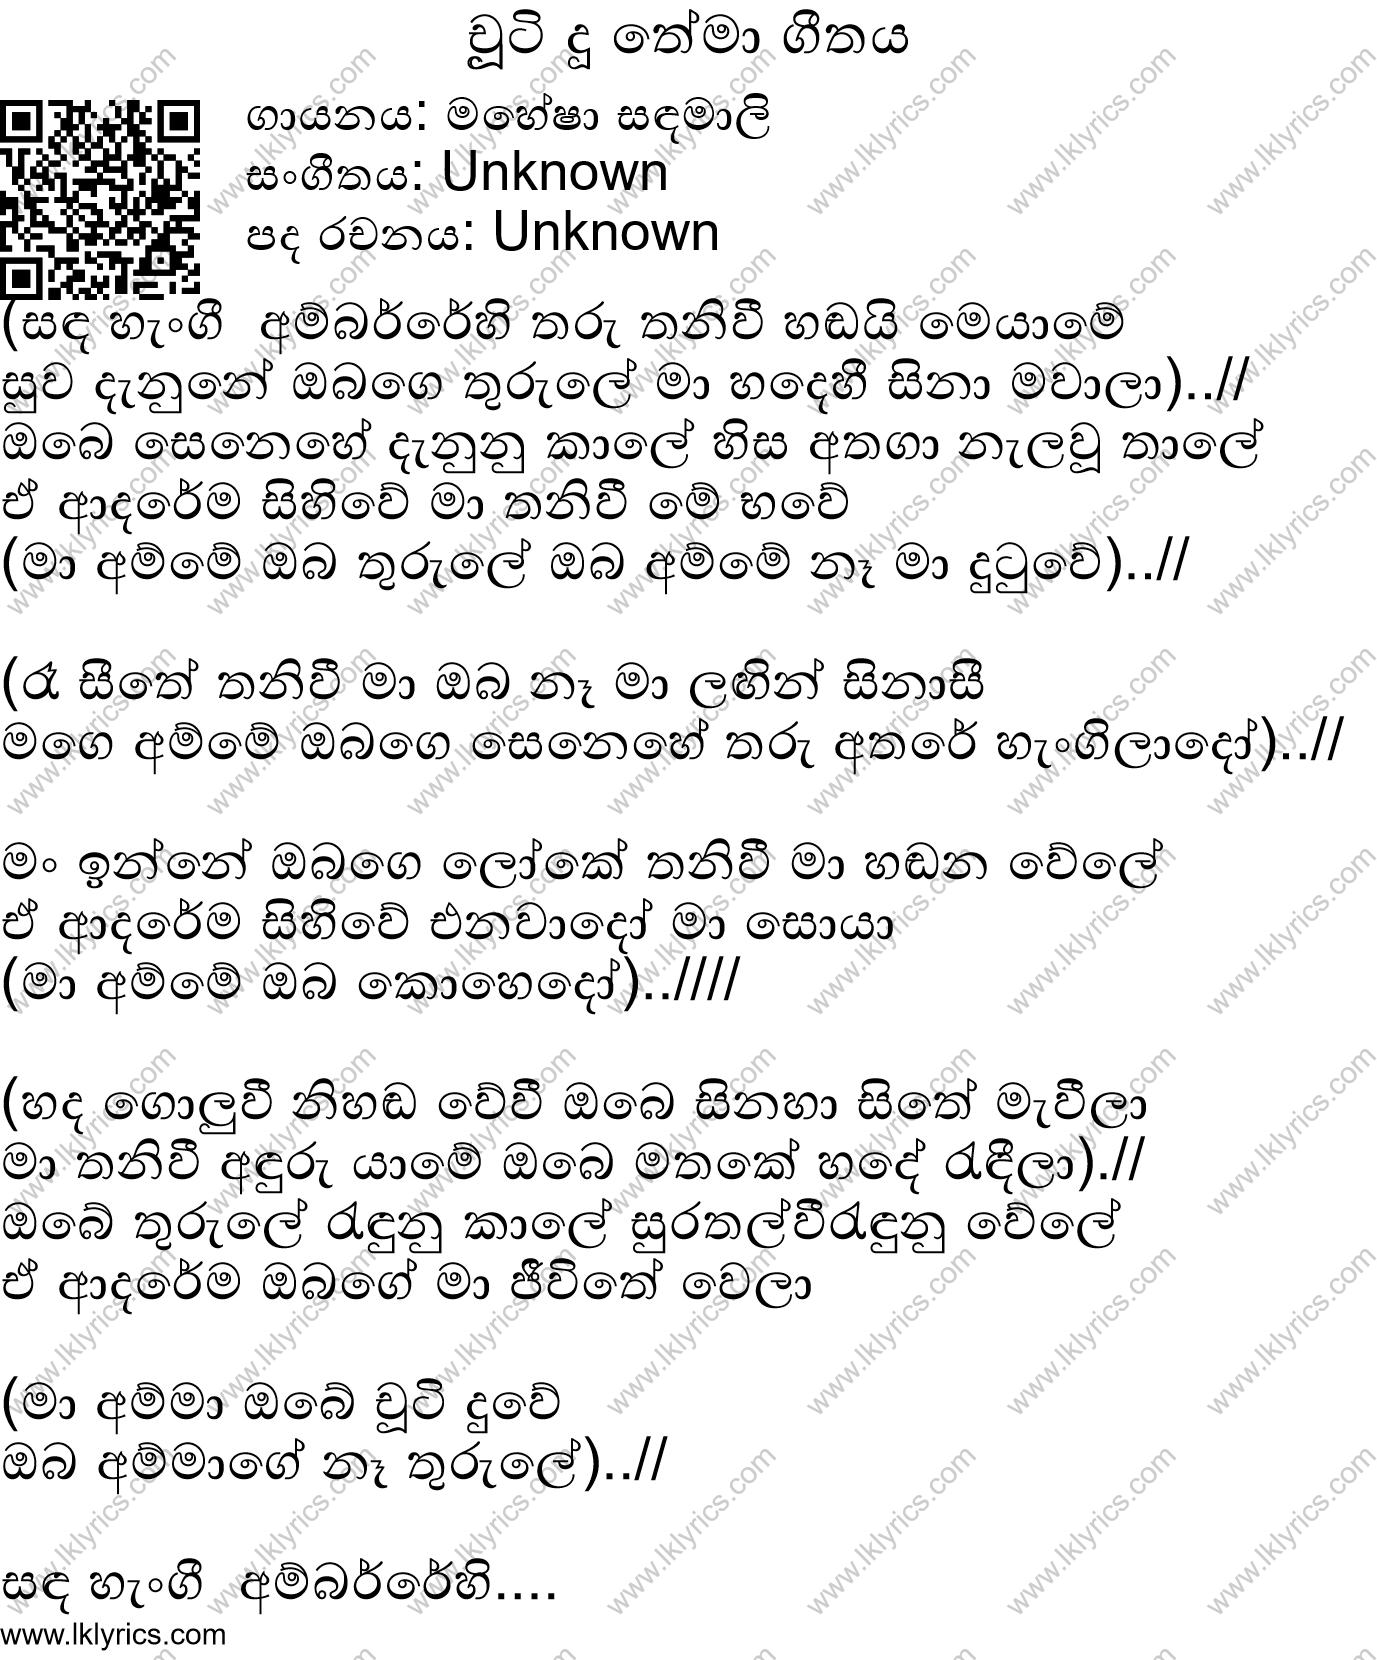 chuti du teledrama theme song mp3 free download